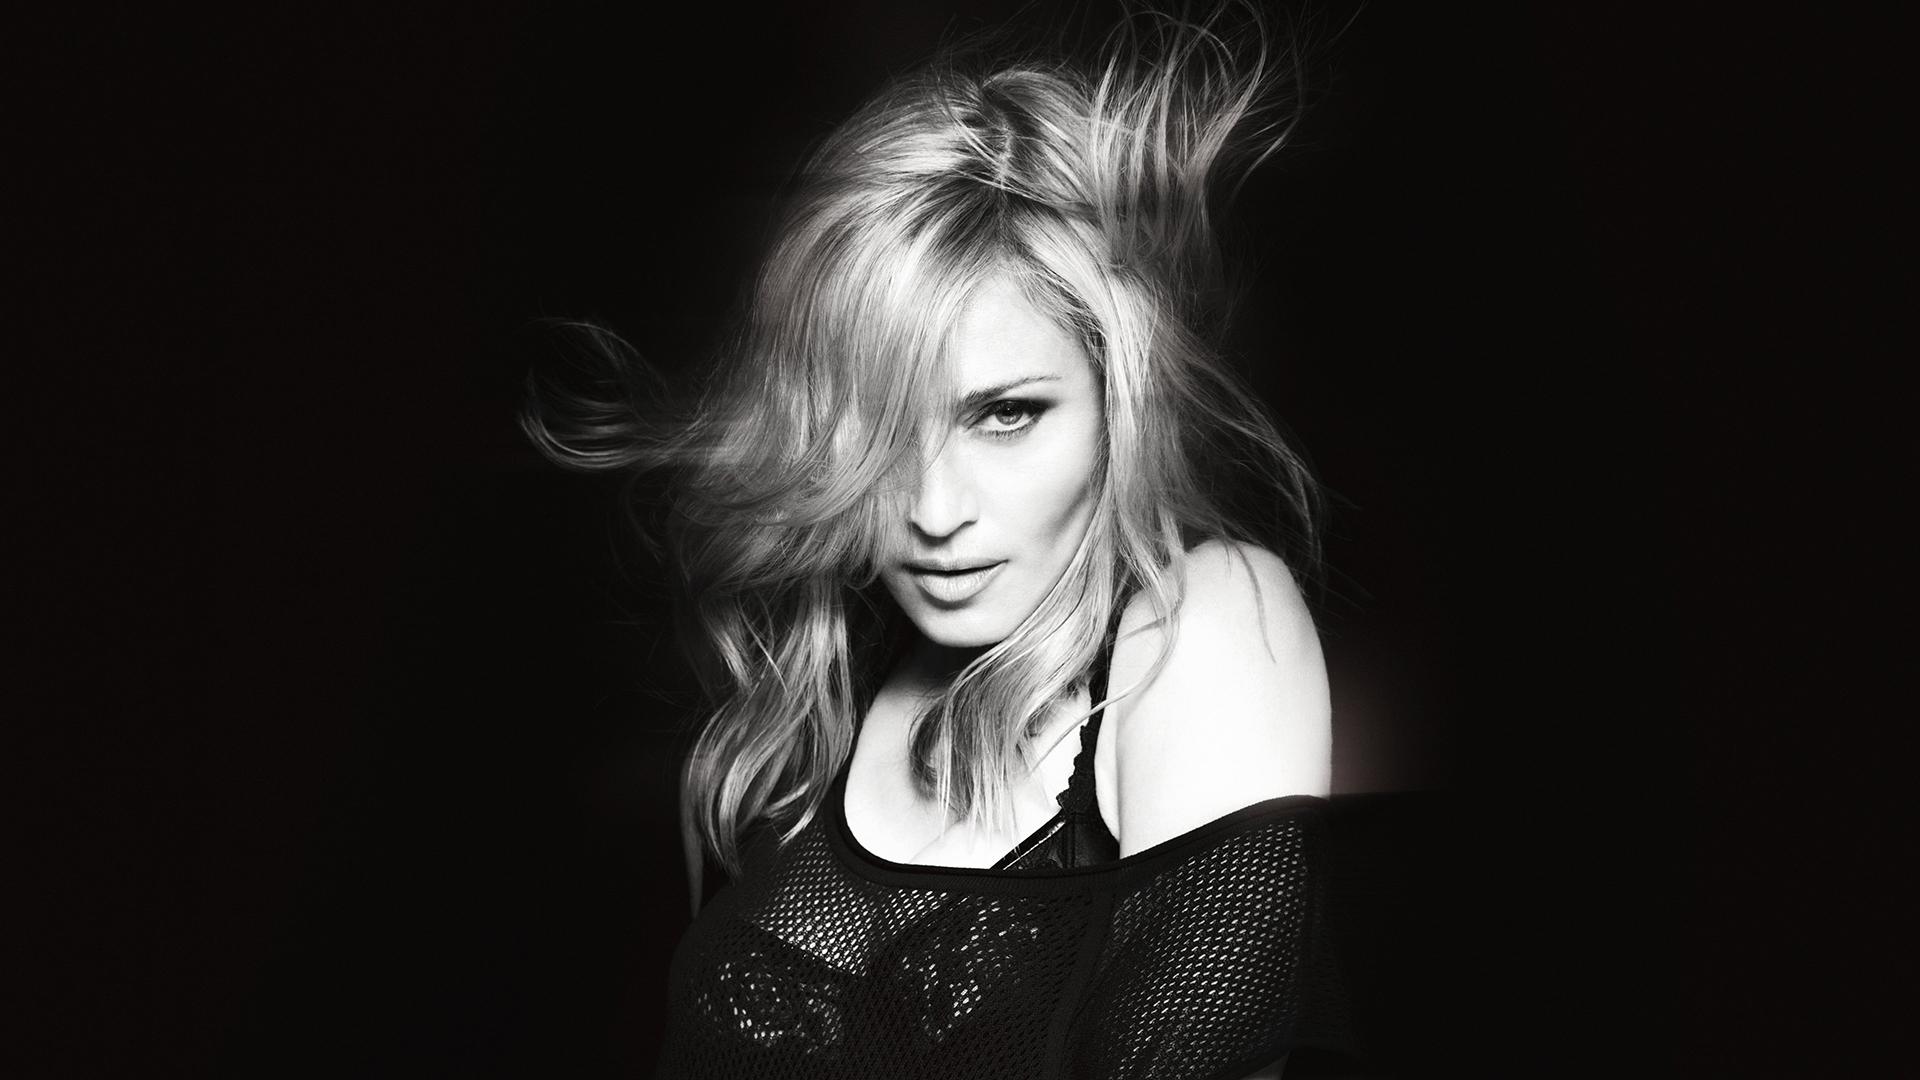 Madonna full hd fondo de pantalla and fondo de escritorio 1920x1080 id 545513 - Madonna hd images ...